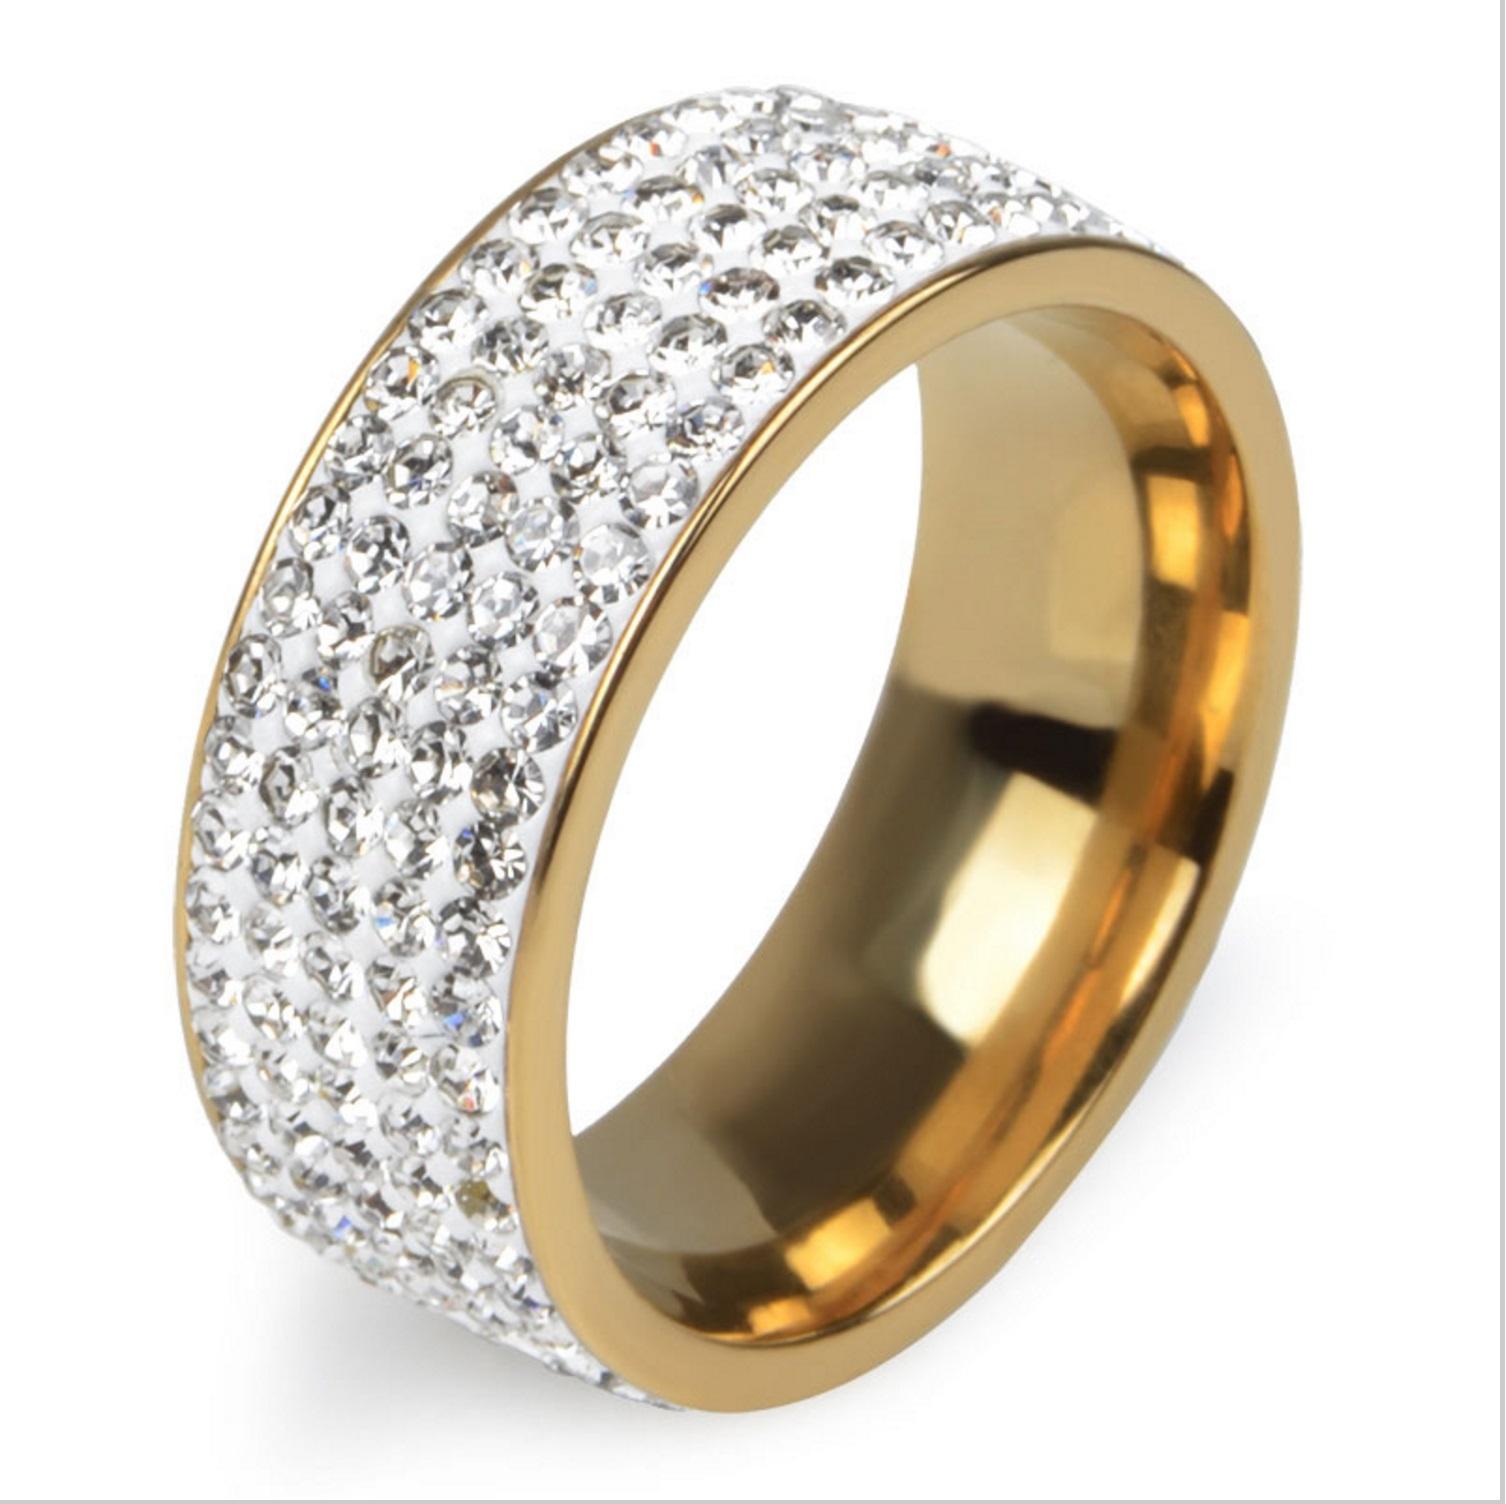 5 Rows Crystal Stainless Steel Ring Women Elegant Full Finger Wedding Jewelry